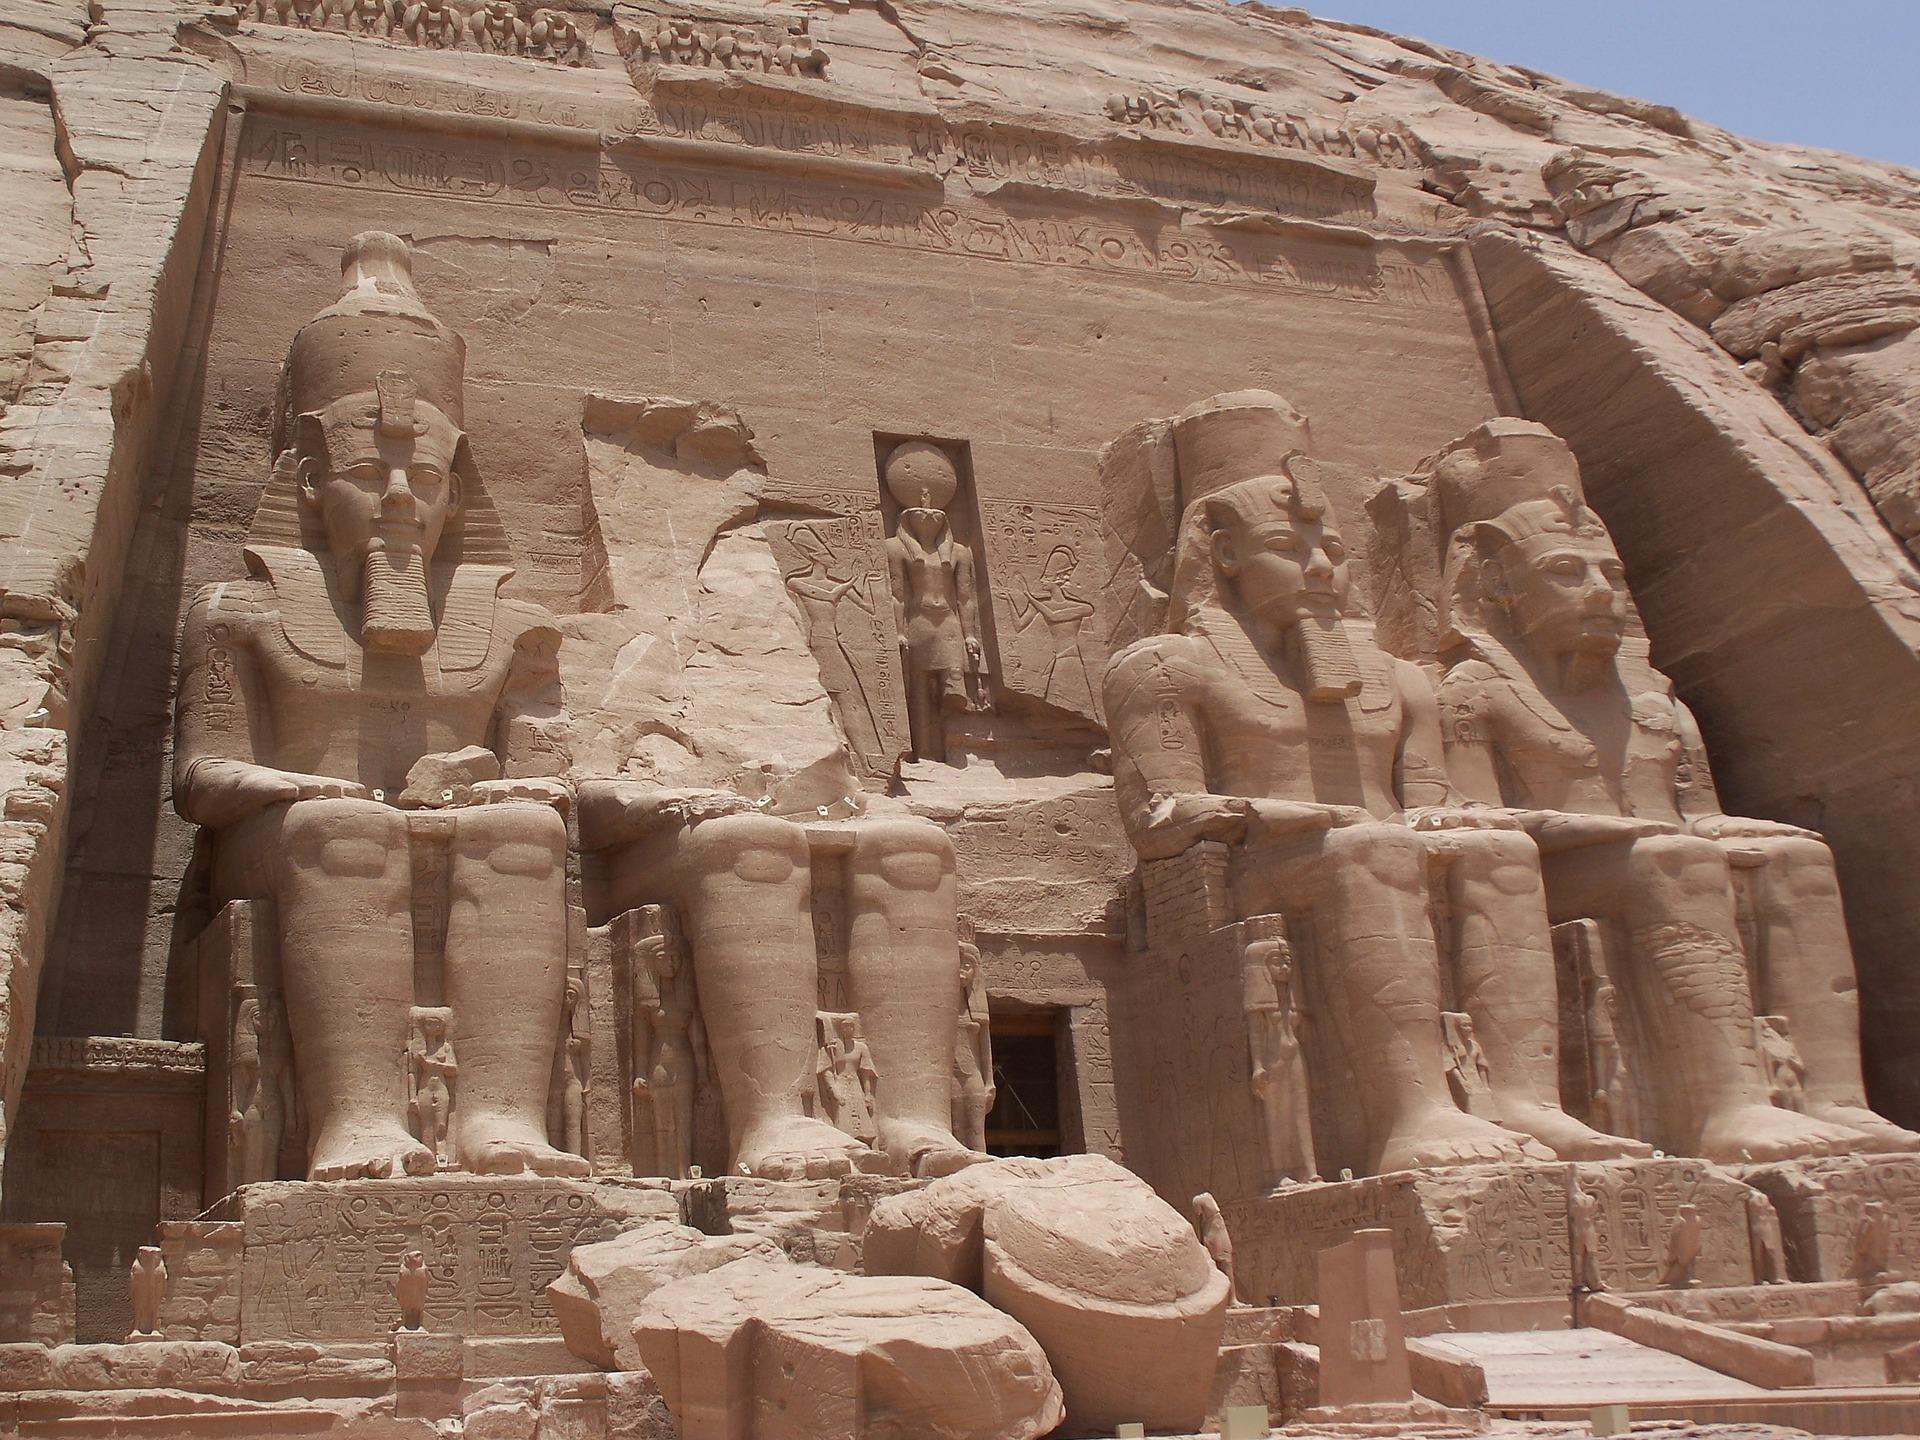 Abu Simbel Temples of Ramesses II, Egypt